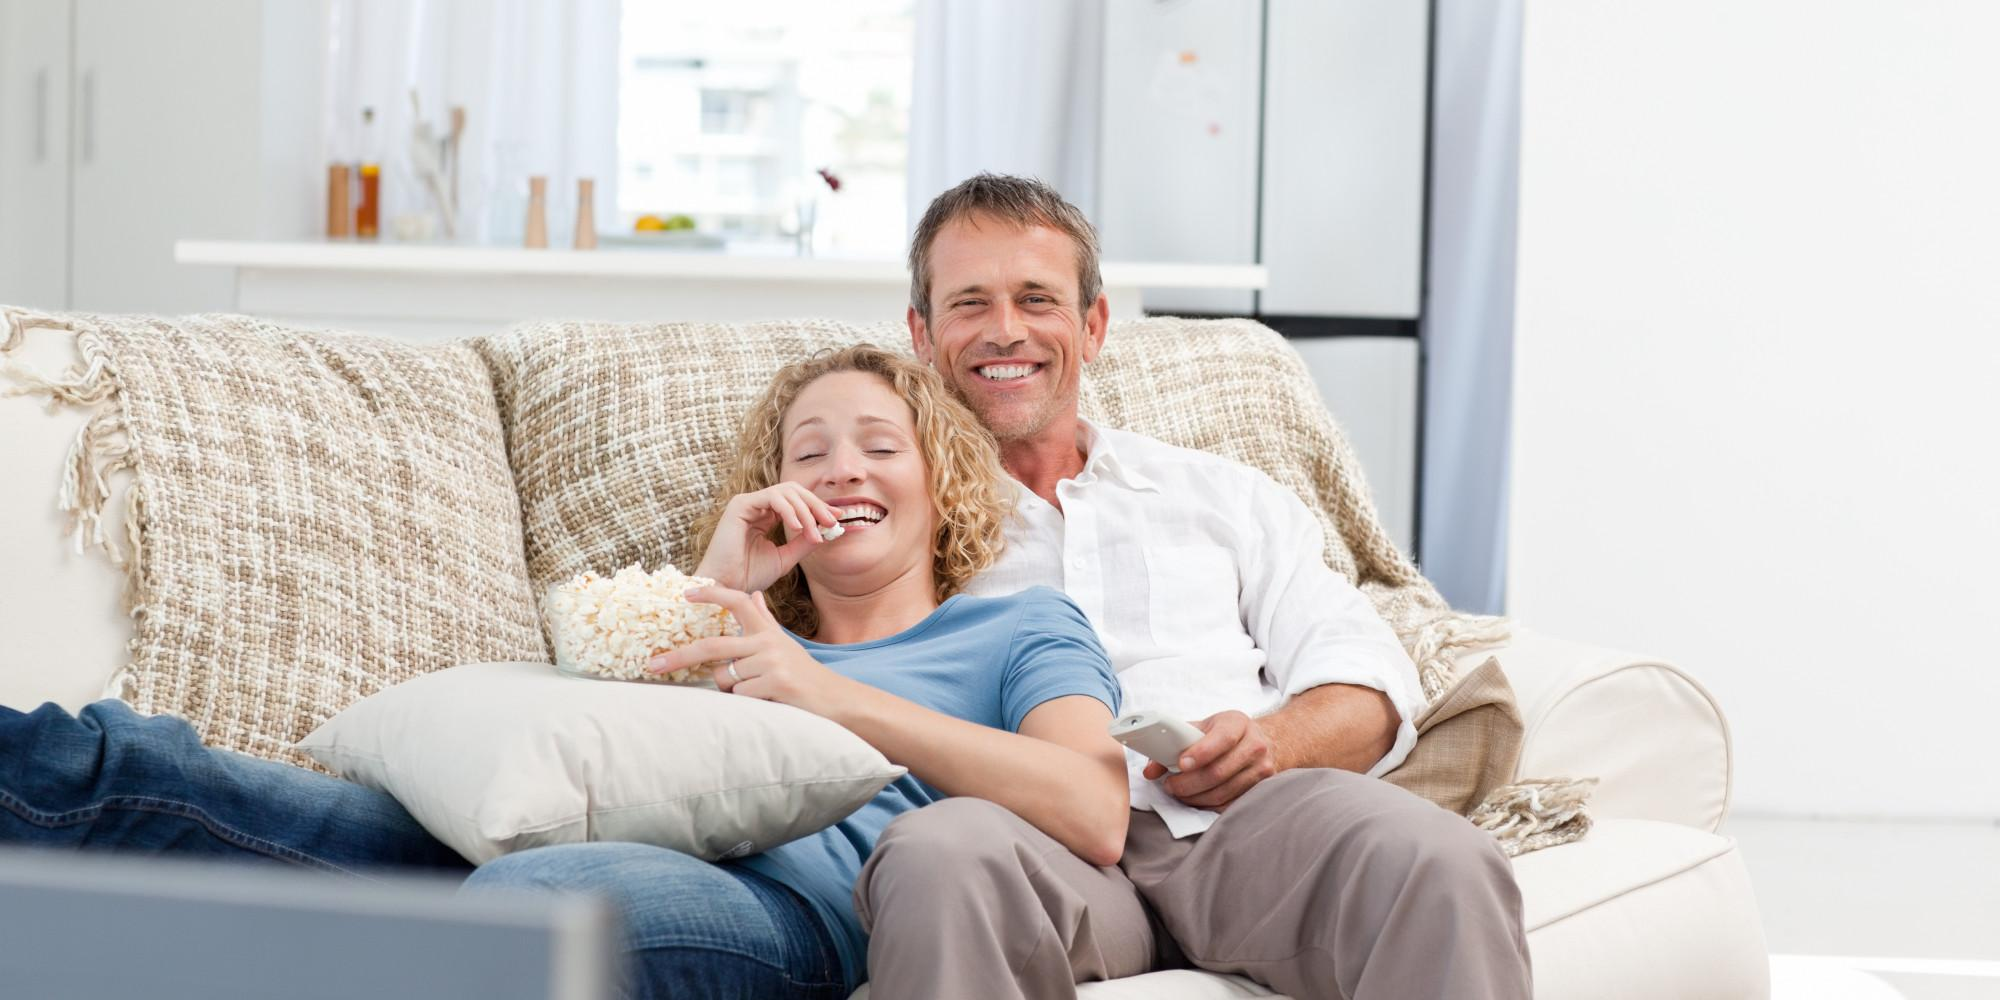 устроить фото на диване пара всего